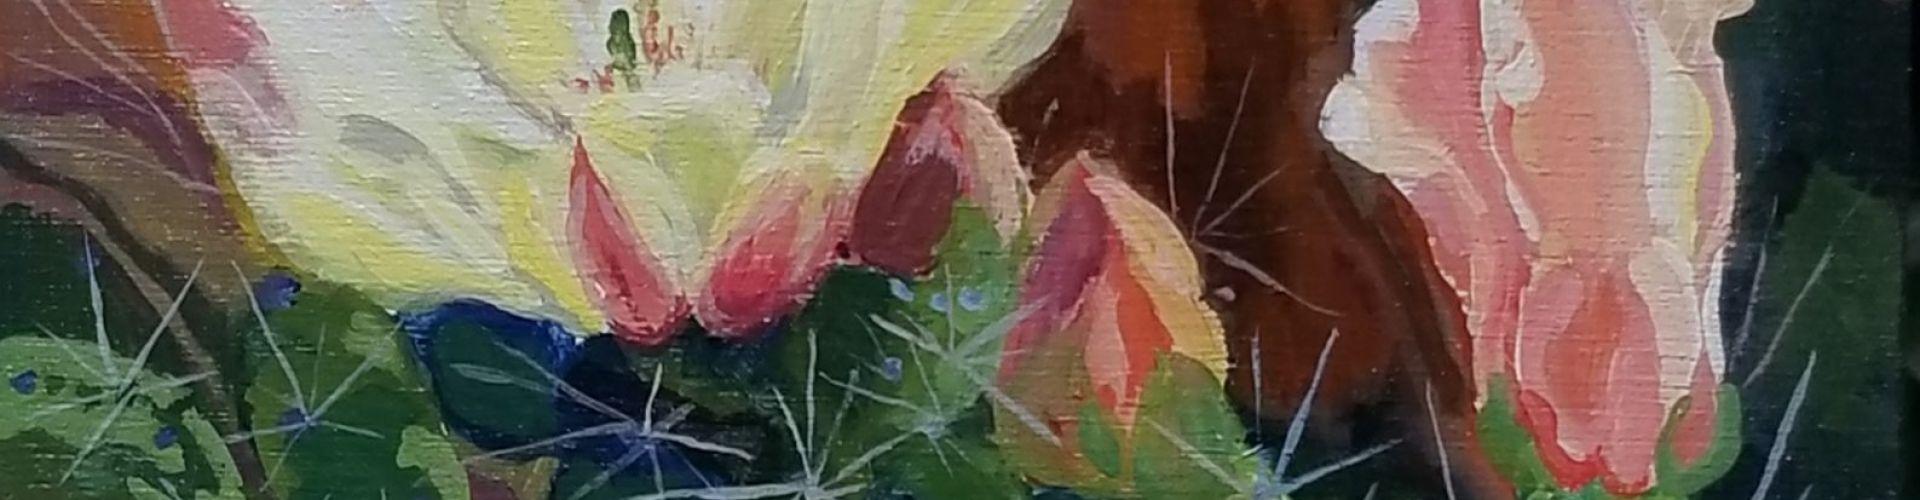 Prickly Pear Cactus on Birch Panel painting by Linda Lovisa